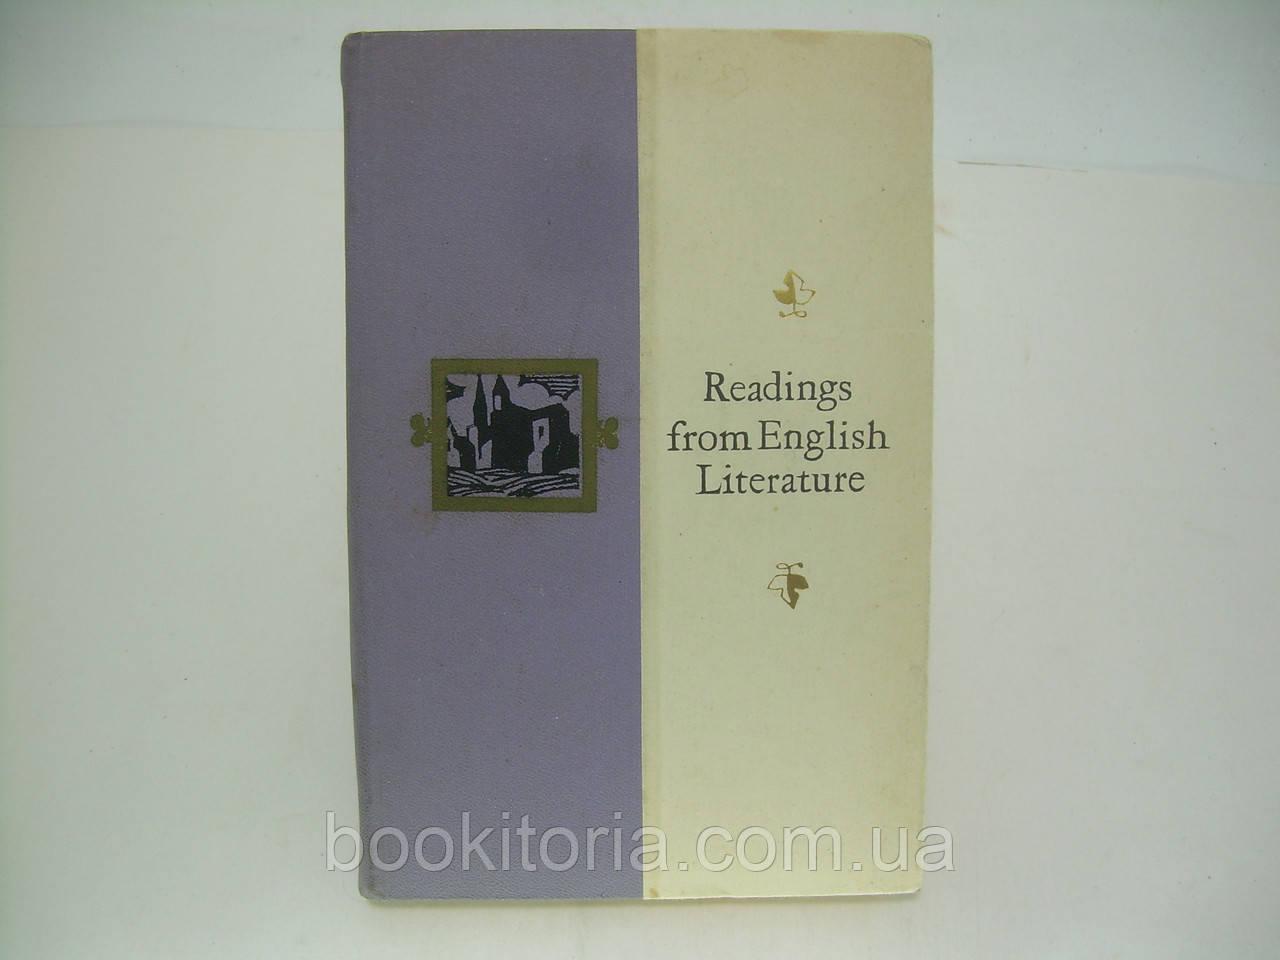 Хрестоматия по английской литературе. Readings from English Literature (б/у).